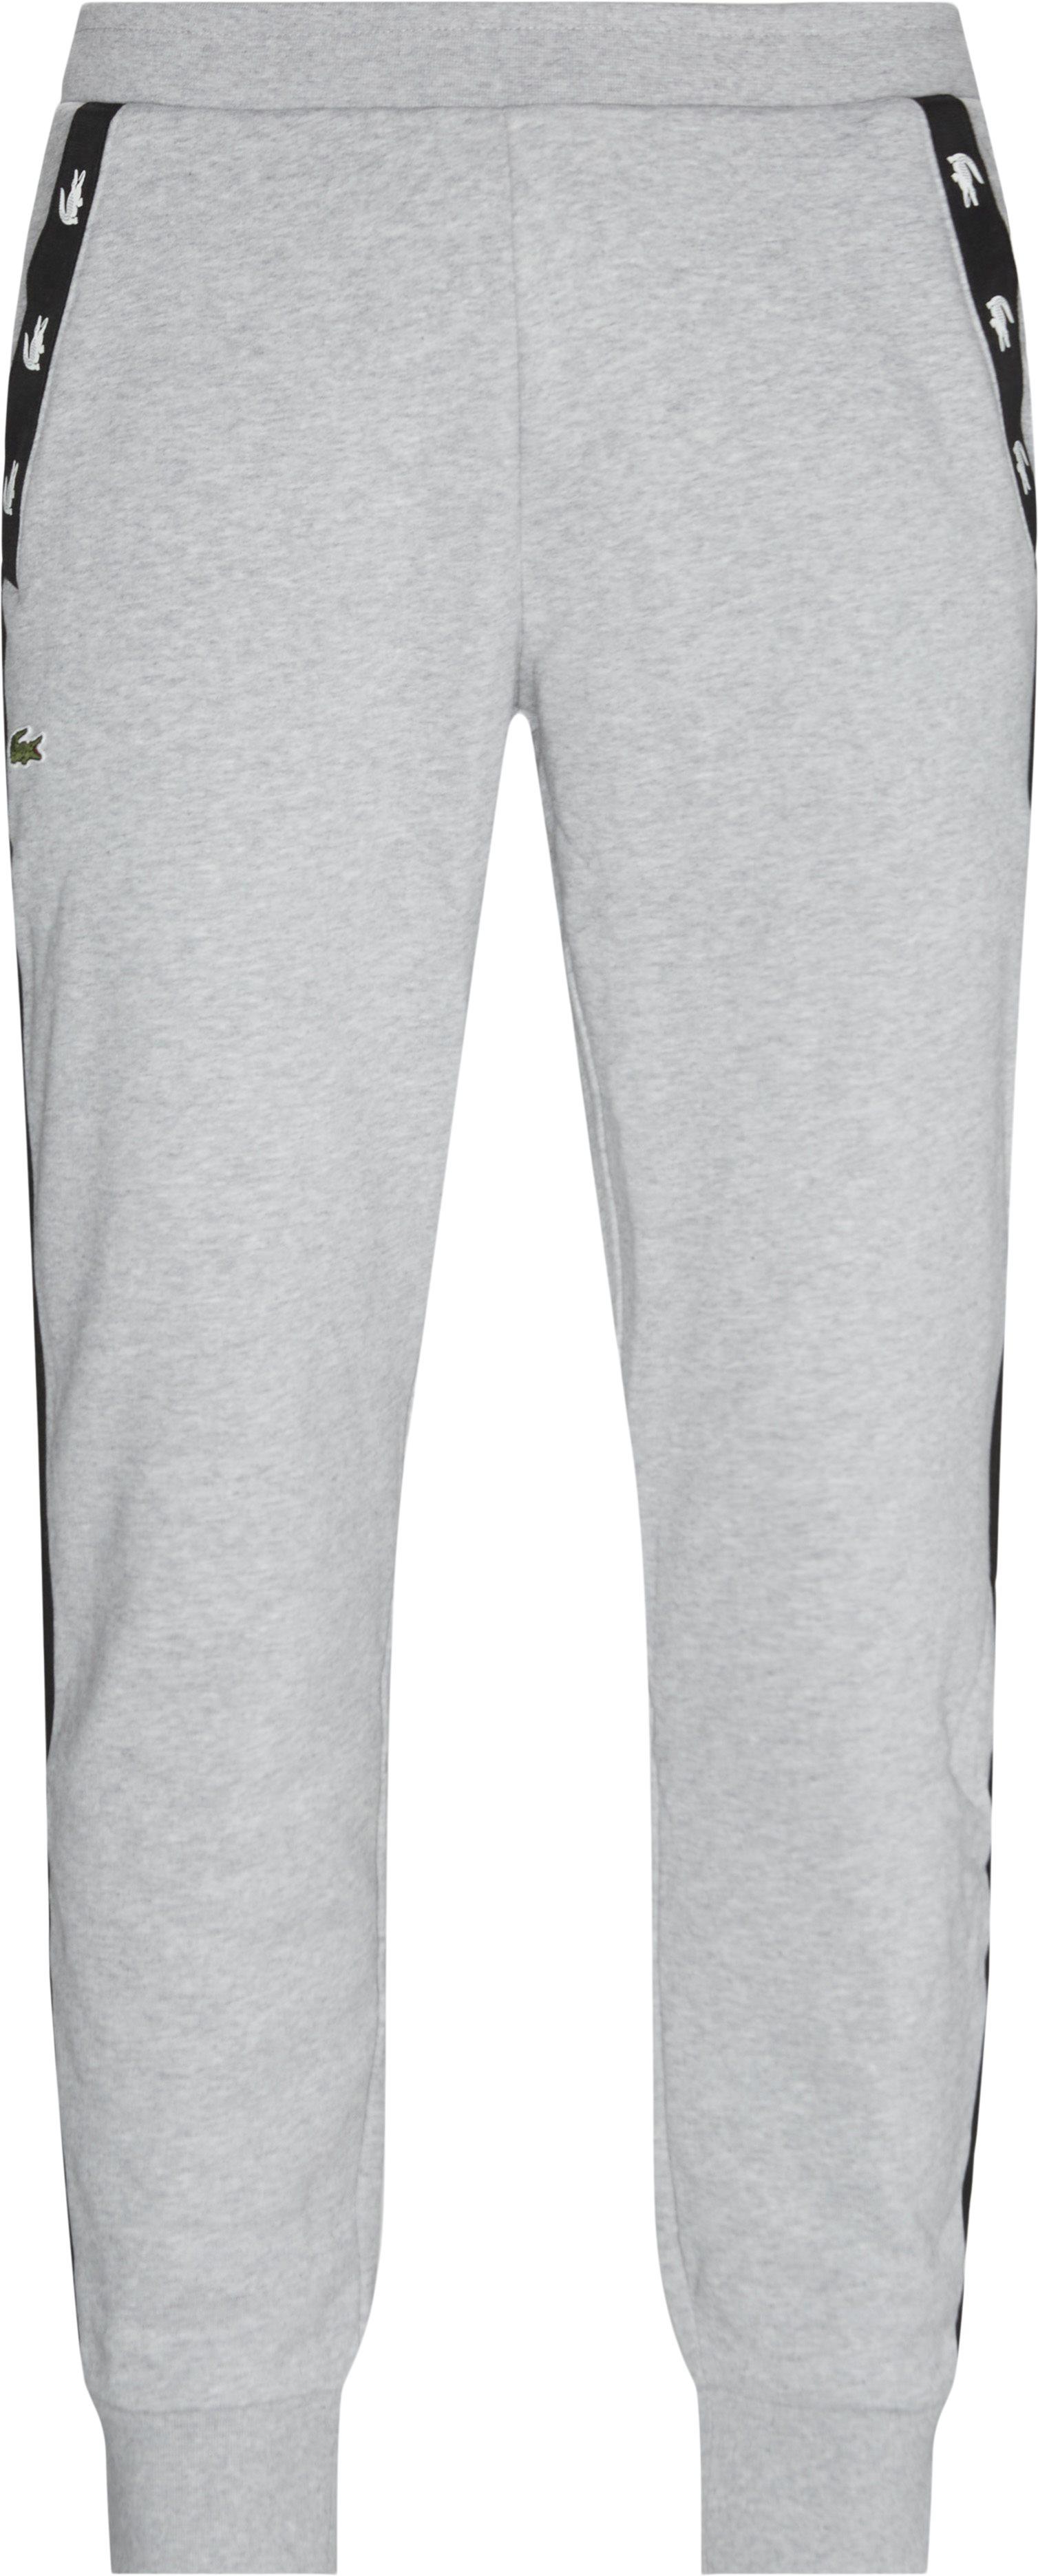 Sweatpants - Bukser - Regular fit - Grå